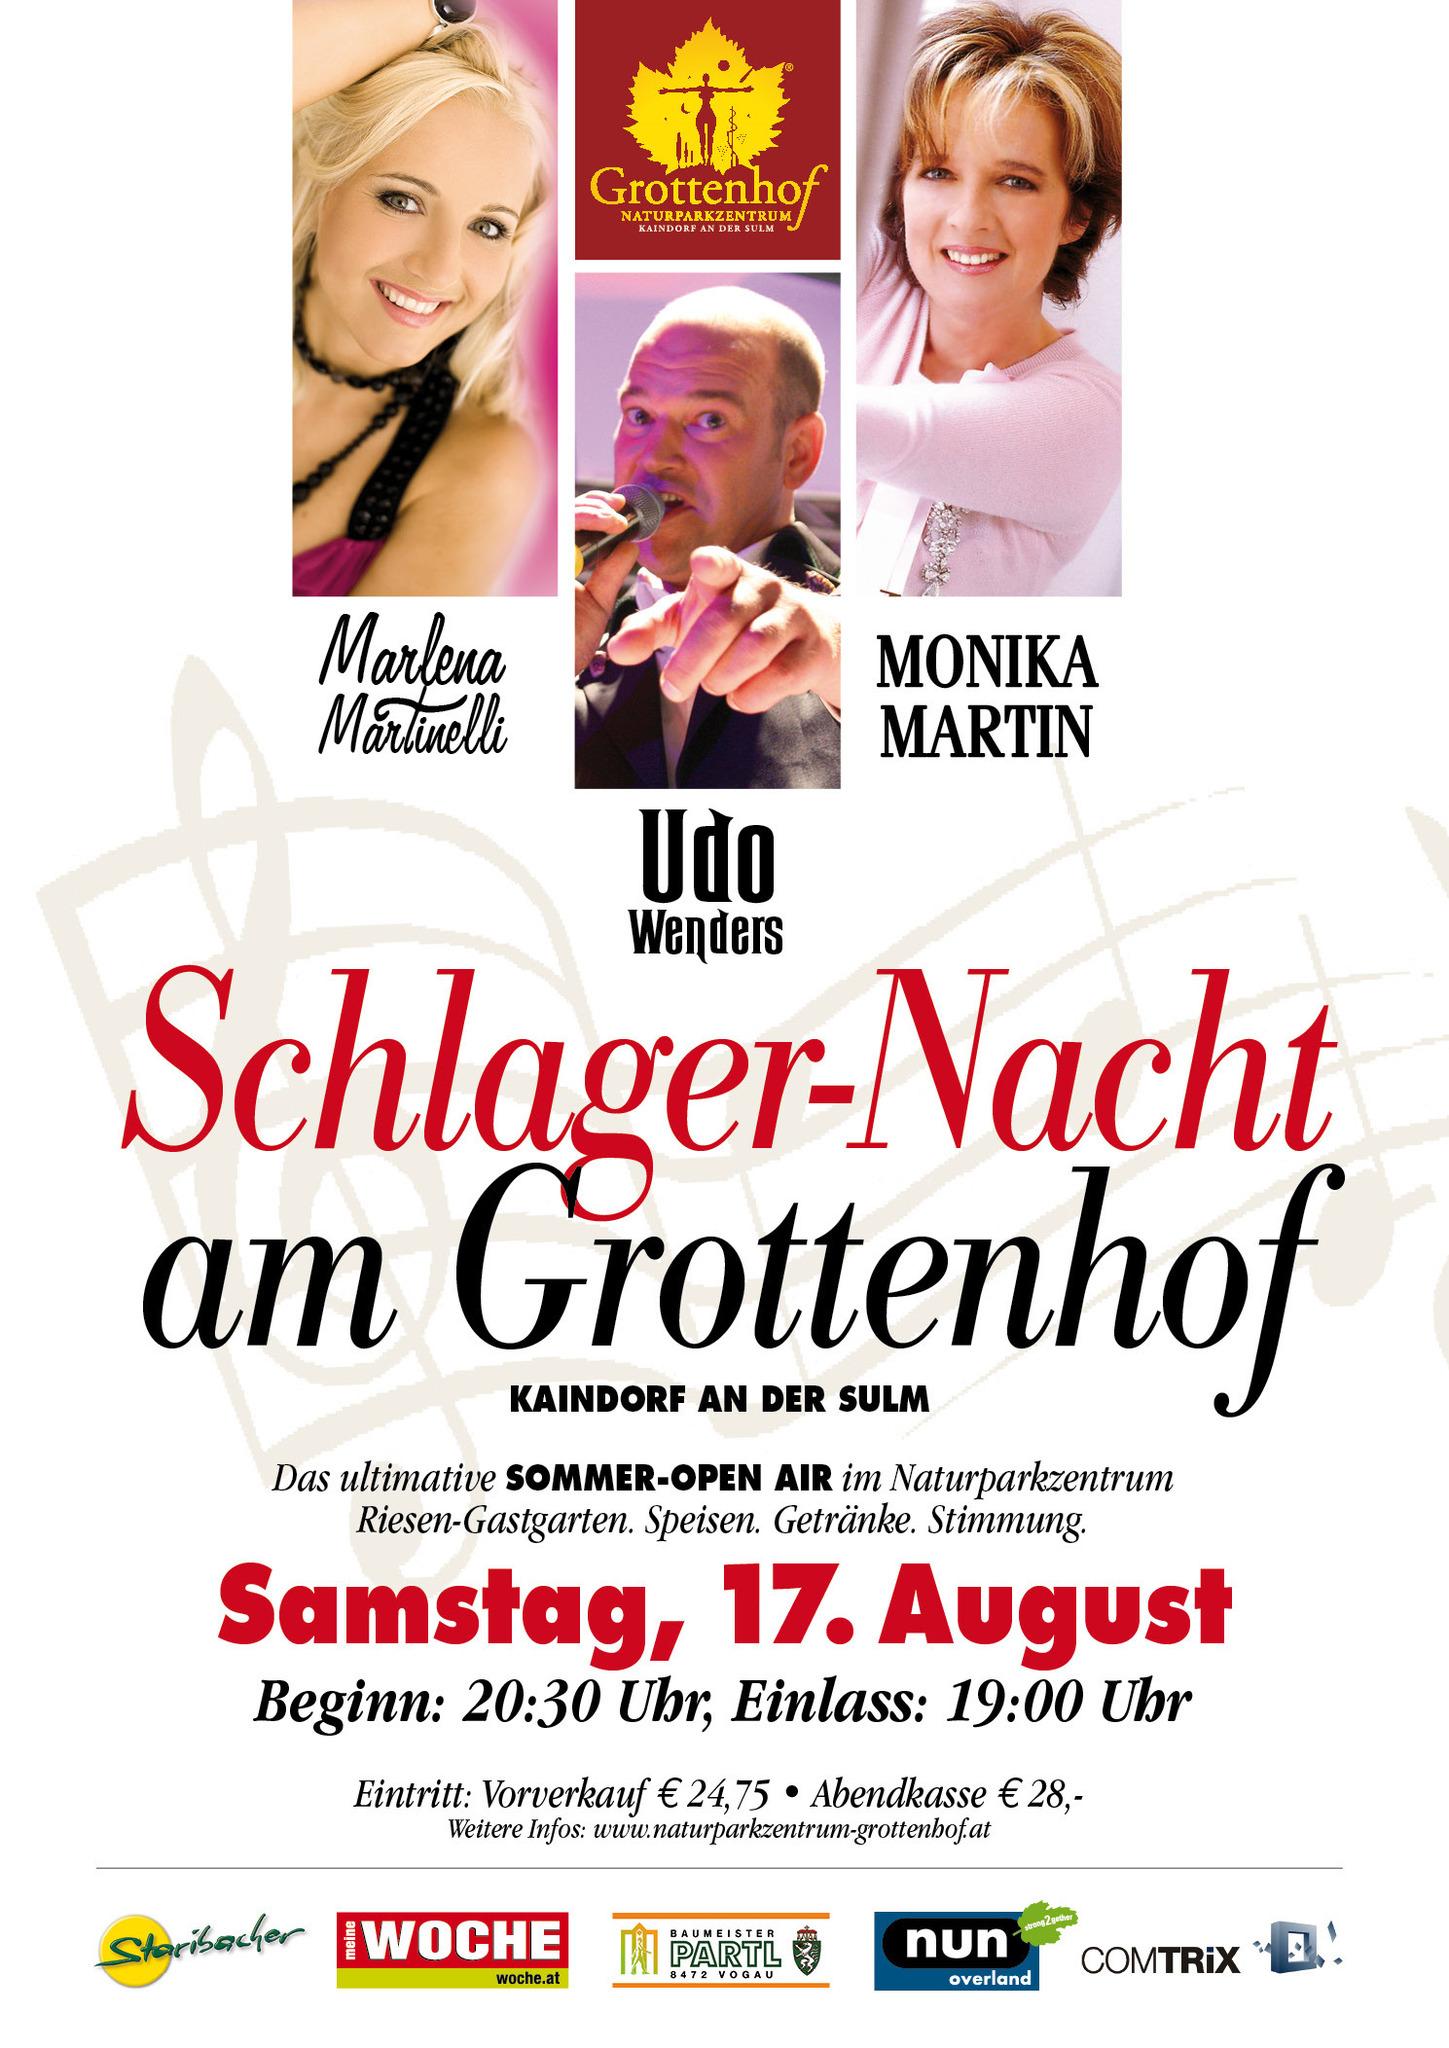 Singlebrse in Leibnitz und Singletreff - flirt-hunter